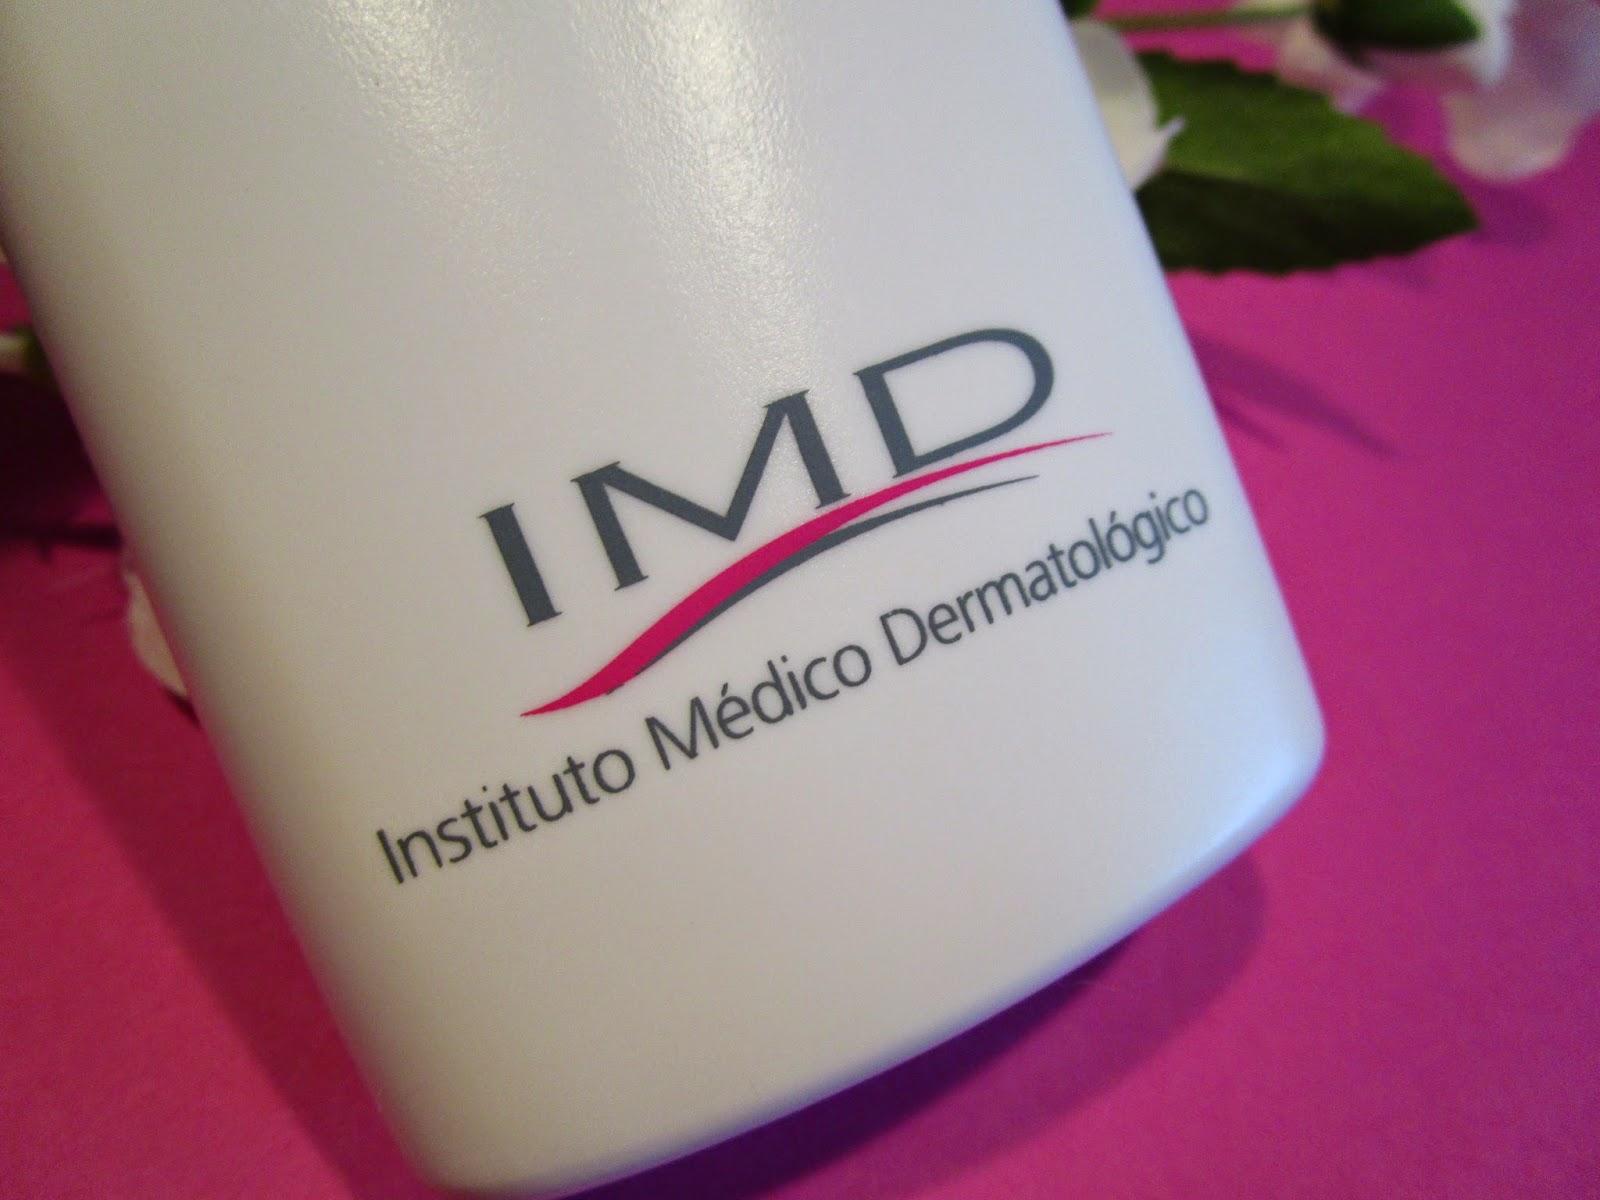 Mascarilla de Colágeno IMD